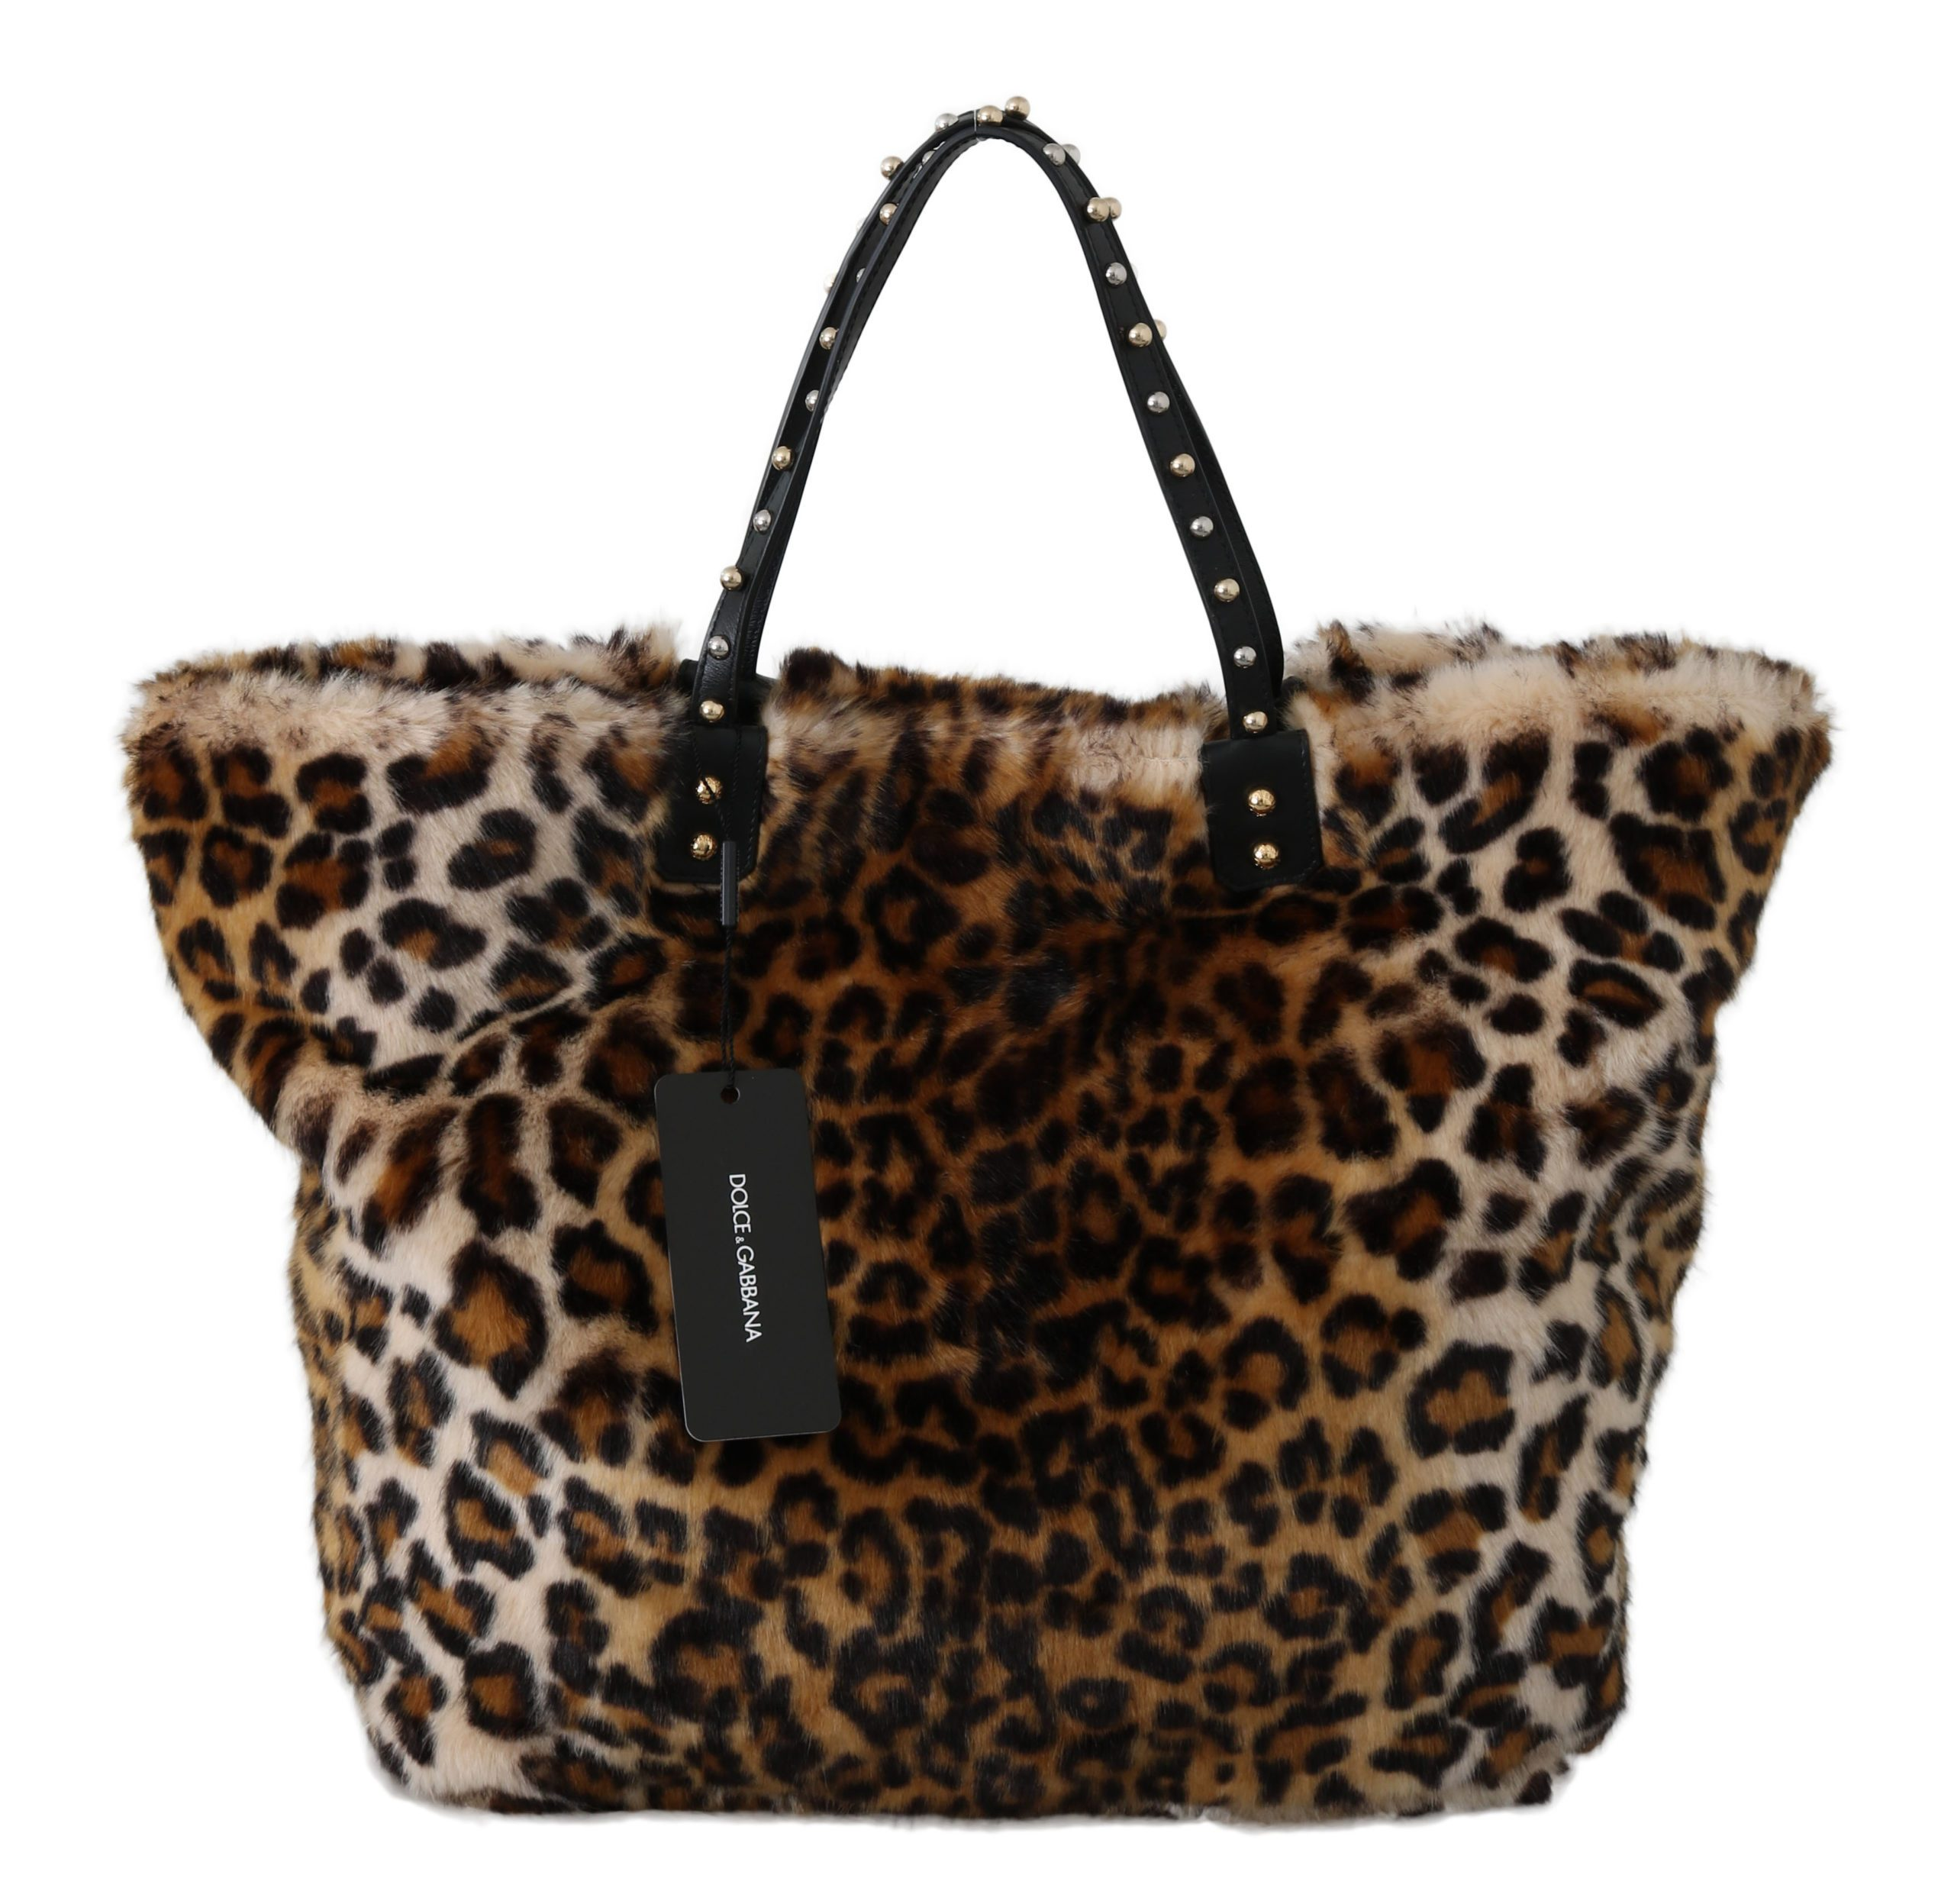 Dolce & Gabbana Women's Leopard Handbag Shopping Tote Bag Brown VAS8794